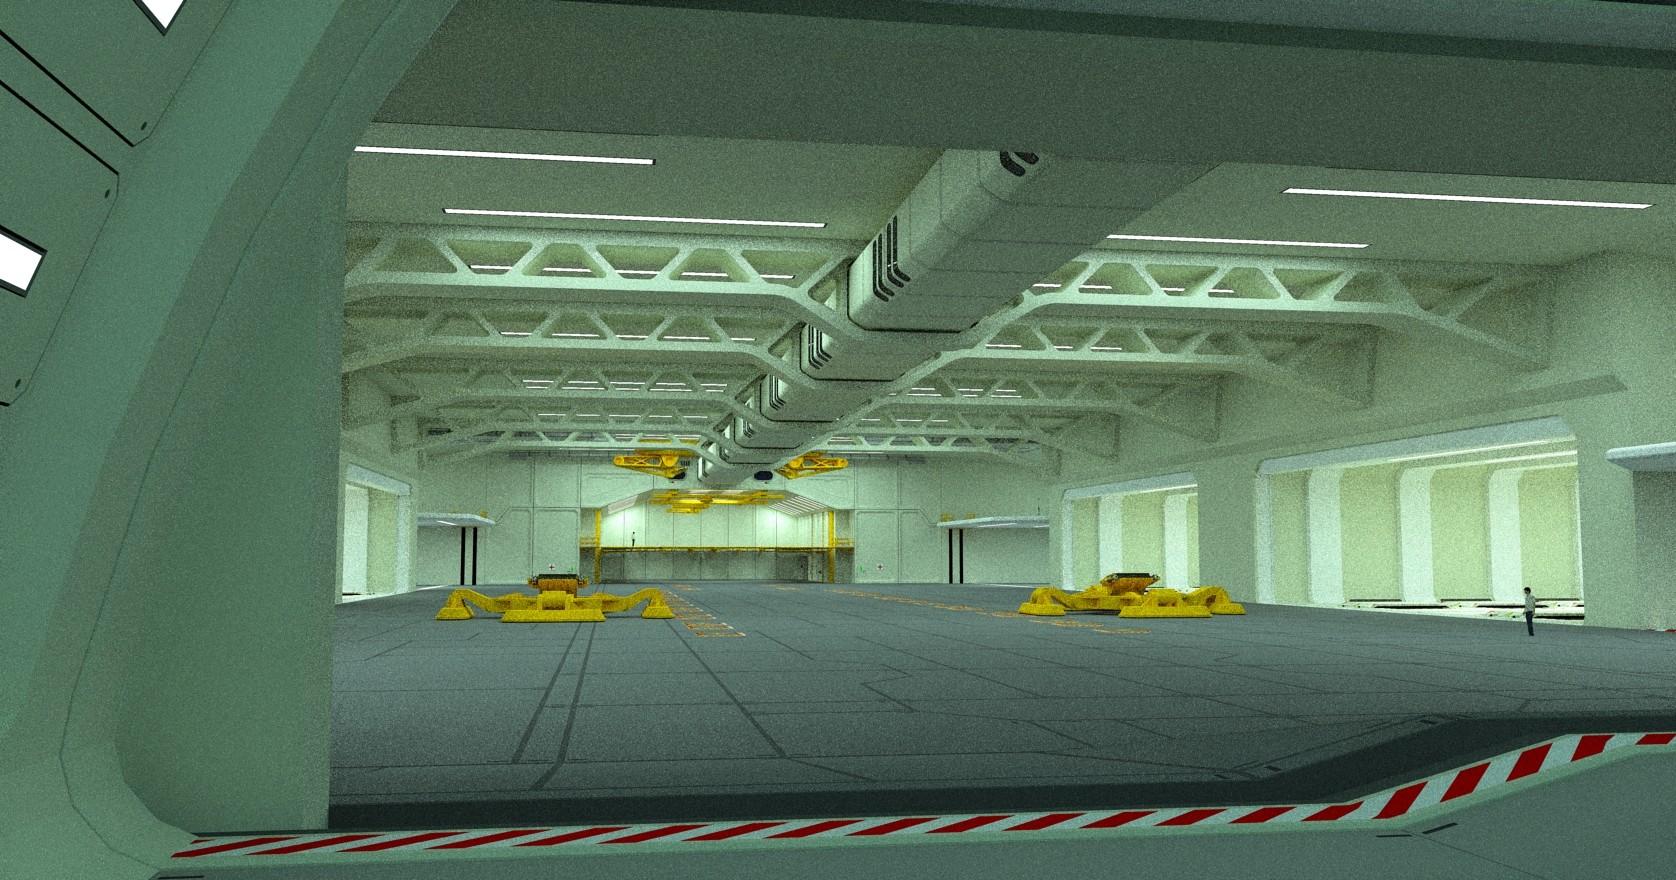 Joachim sverd meridian hangar deck3